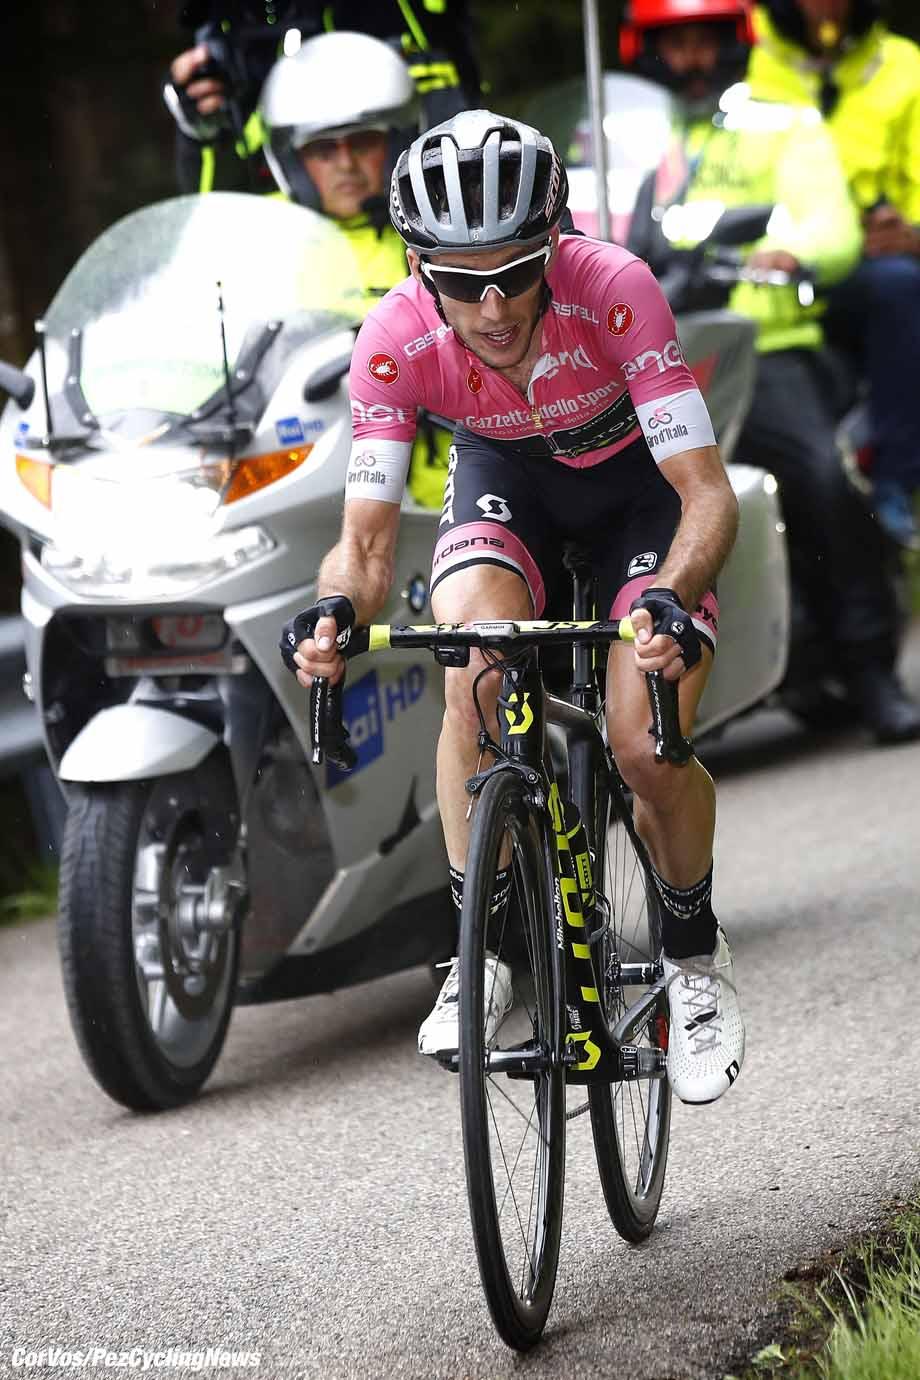 Monte Zoncolan  - Italië - wielrennen - cycling - cyclisme - radsport -   Simon Yates (GBR - Mitchelton - Scott) pictured during the 101st Giro d'Italia 2018 - stage 14 from San Vito al Tagliamento to Monte Zoncolan (186 KM) - photo LB/RB/Cor Vos © 2018